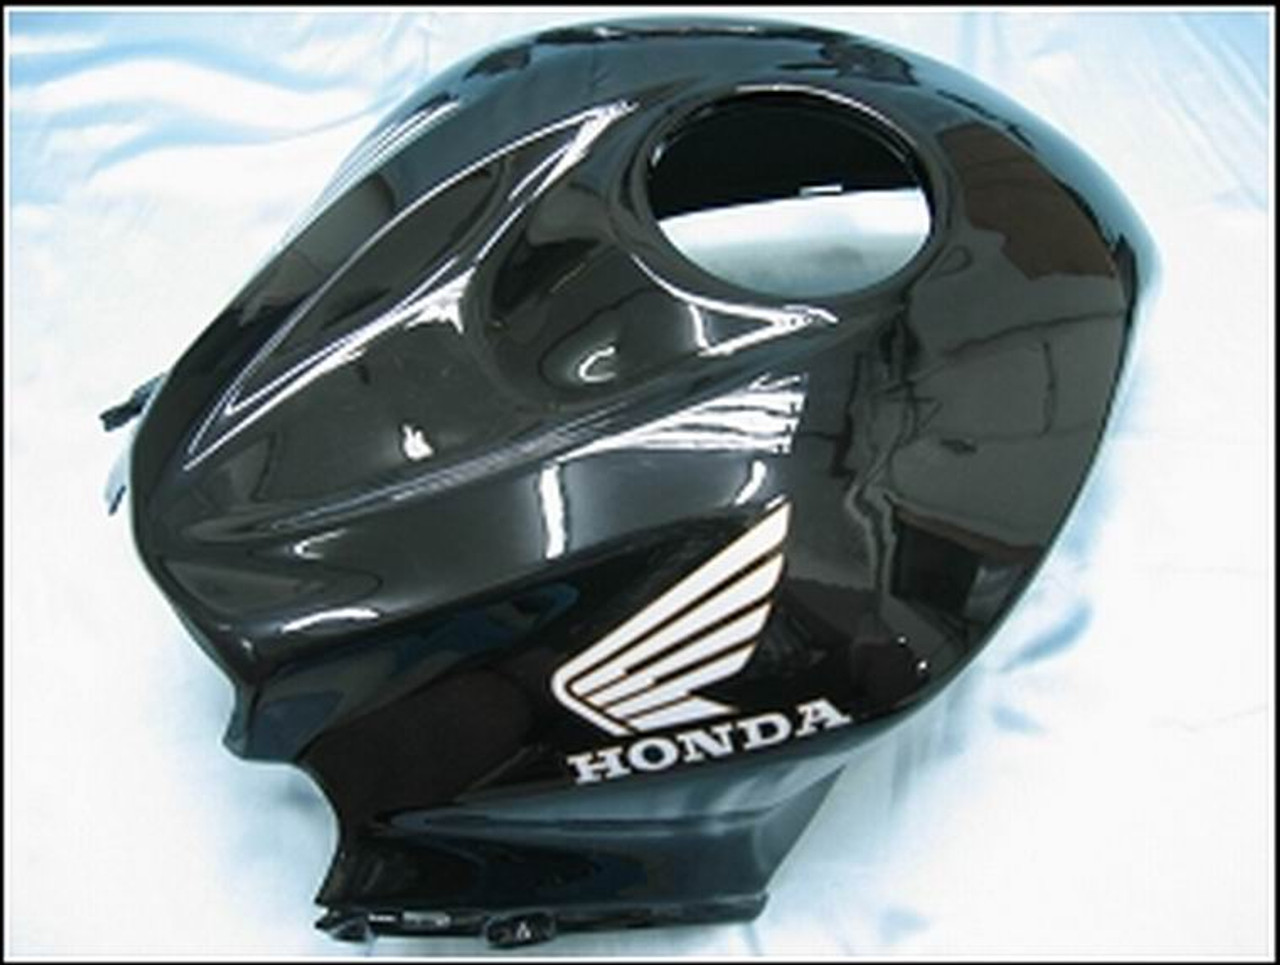 Fairings Honda CBR 600 RR Black West Racing (2007-2008)